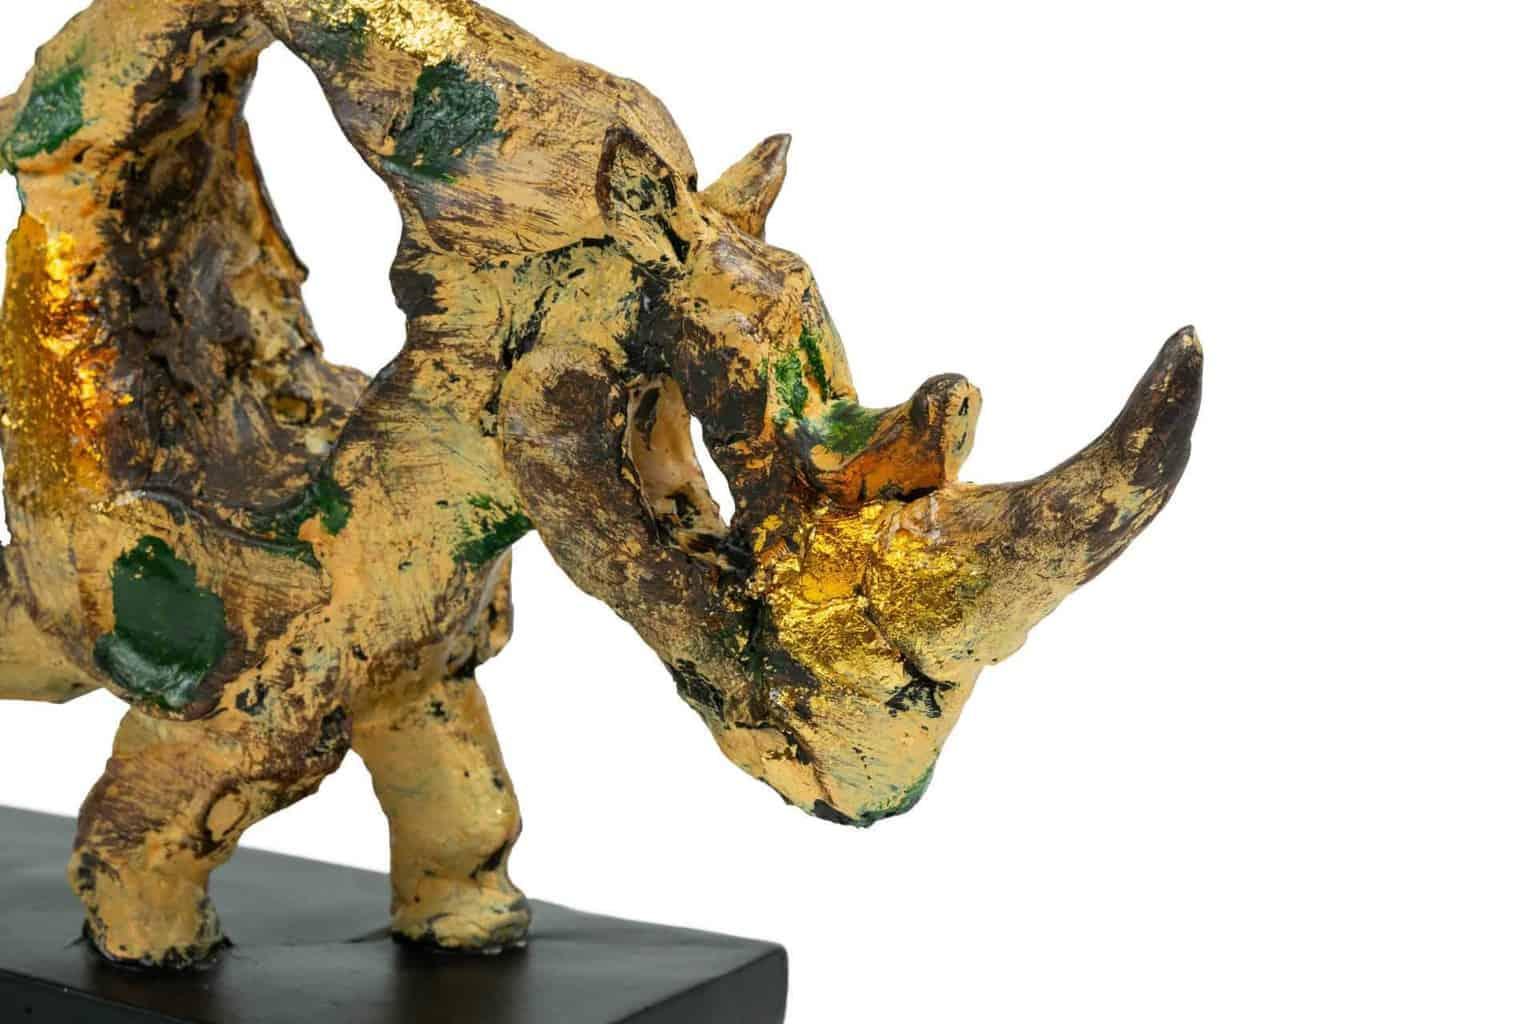 Decoratie-neushoorn-goud-3-scaled-1.jpg